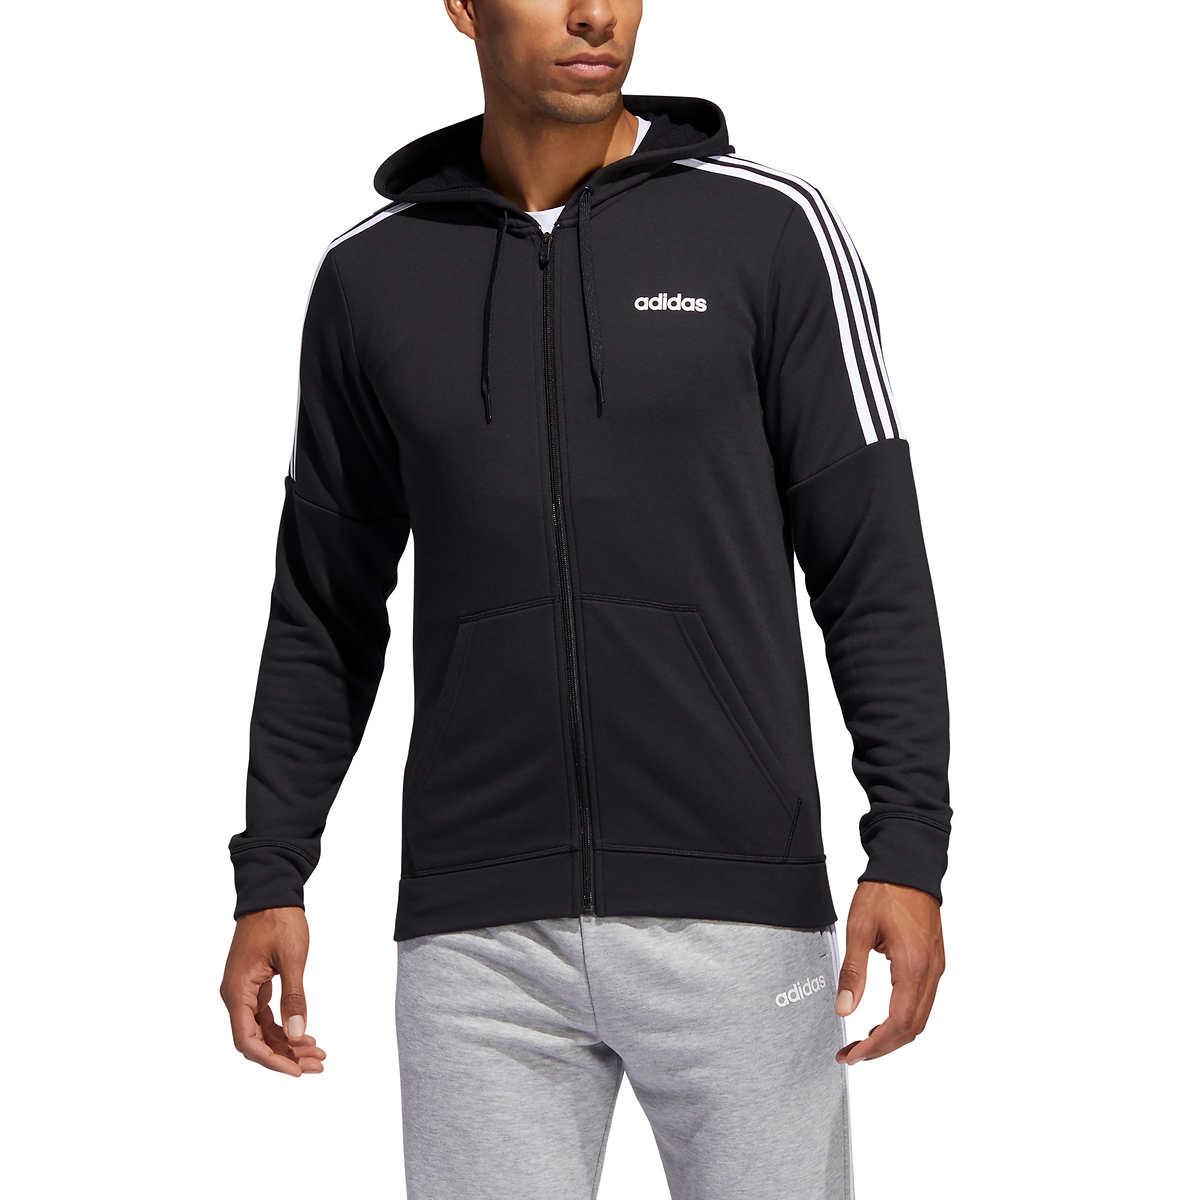 Adidas Men's French Terry Full Zip Sweatshirt for $14.97 + Free Shipping